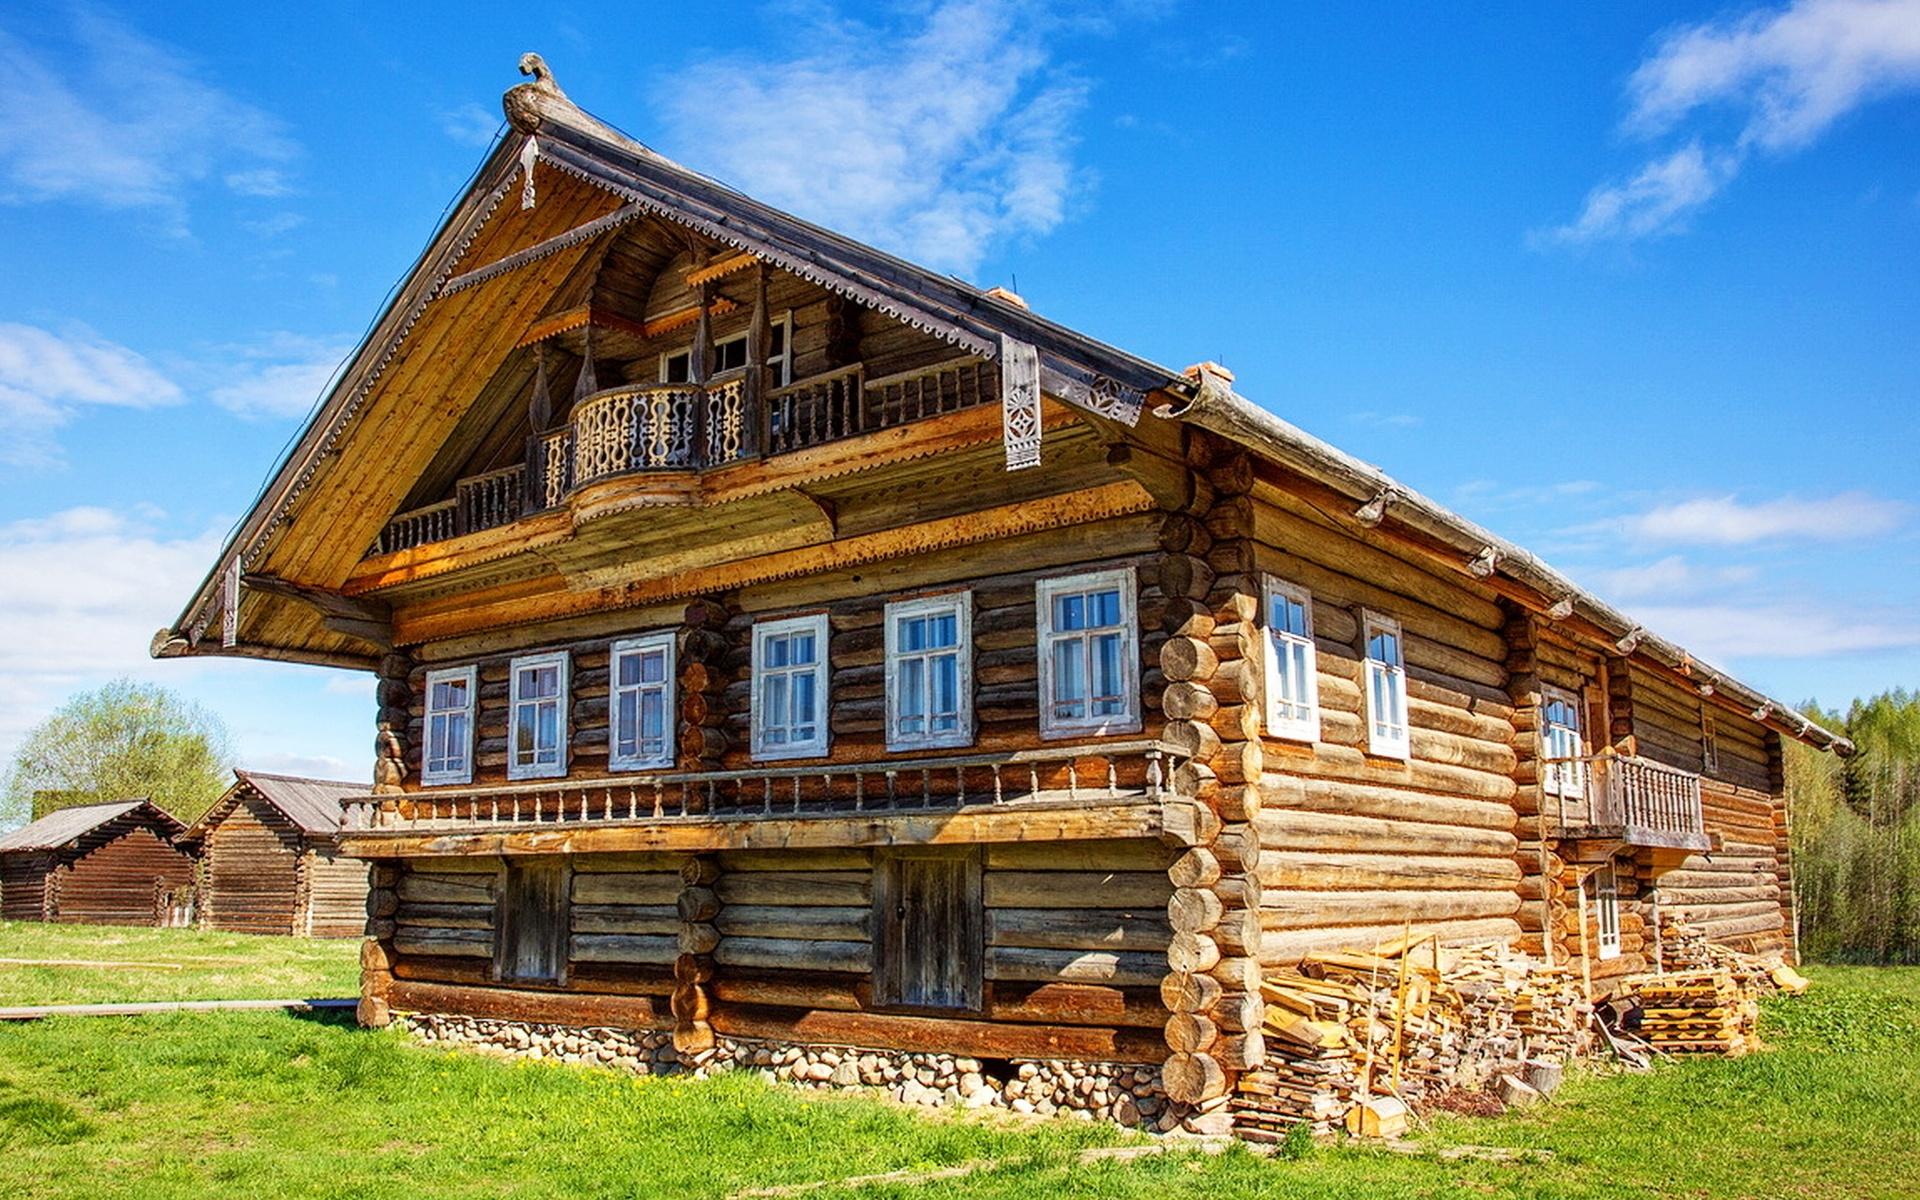 вам картинки деревянного деревенского дома свою